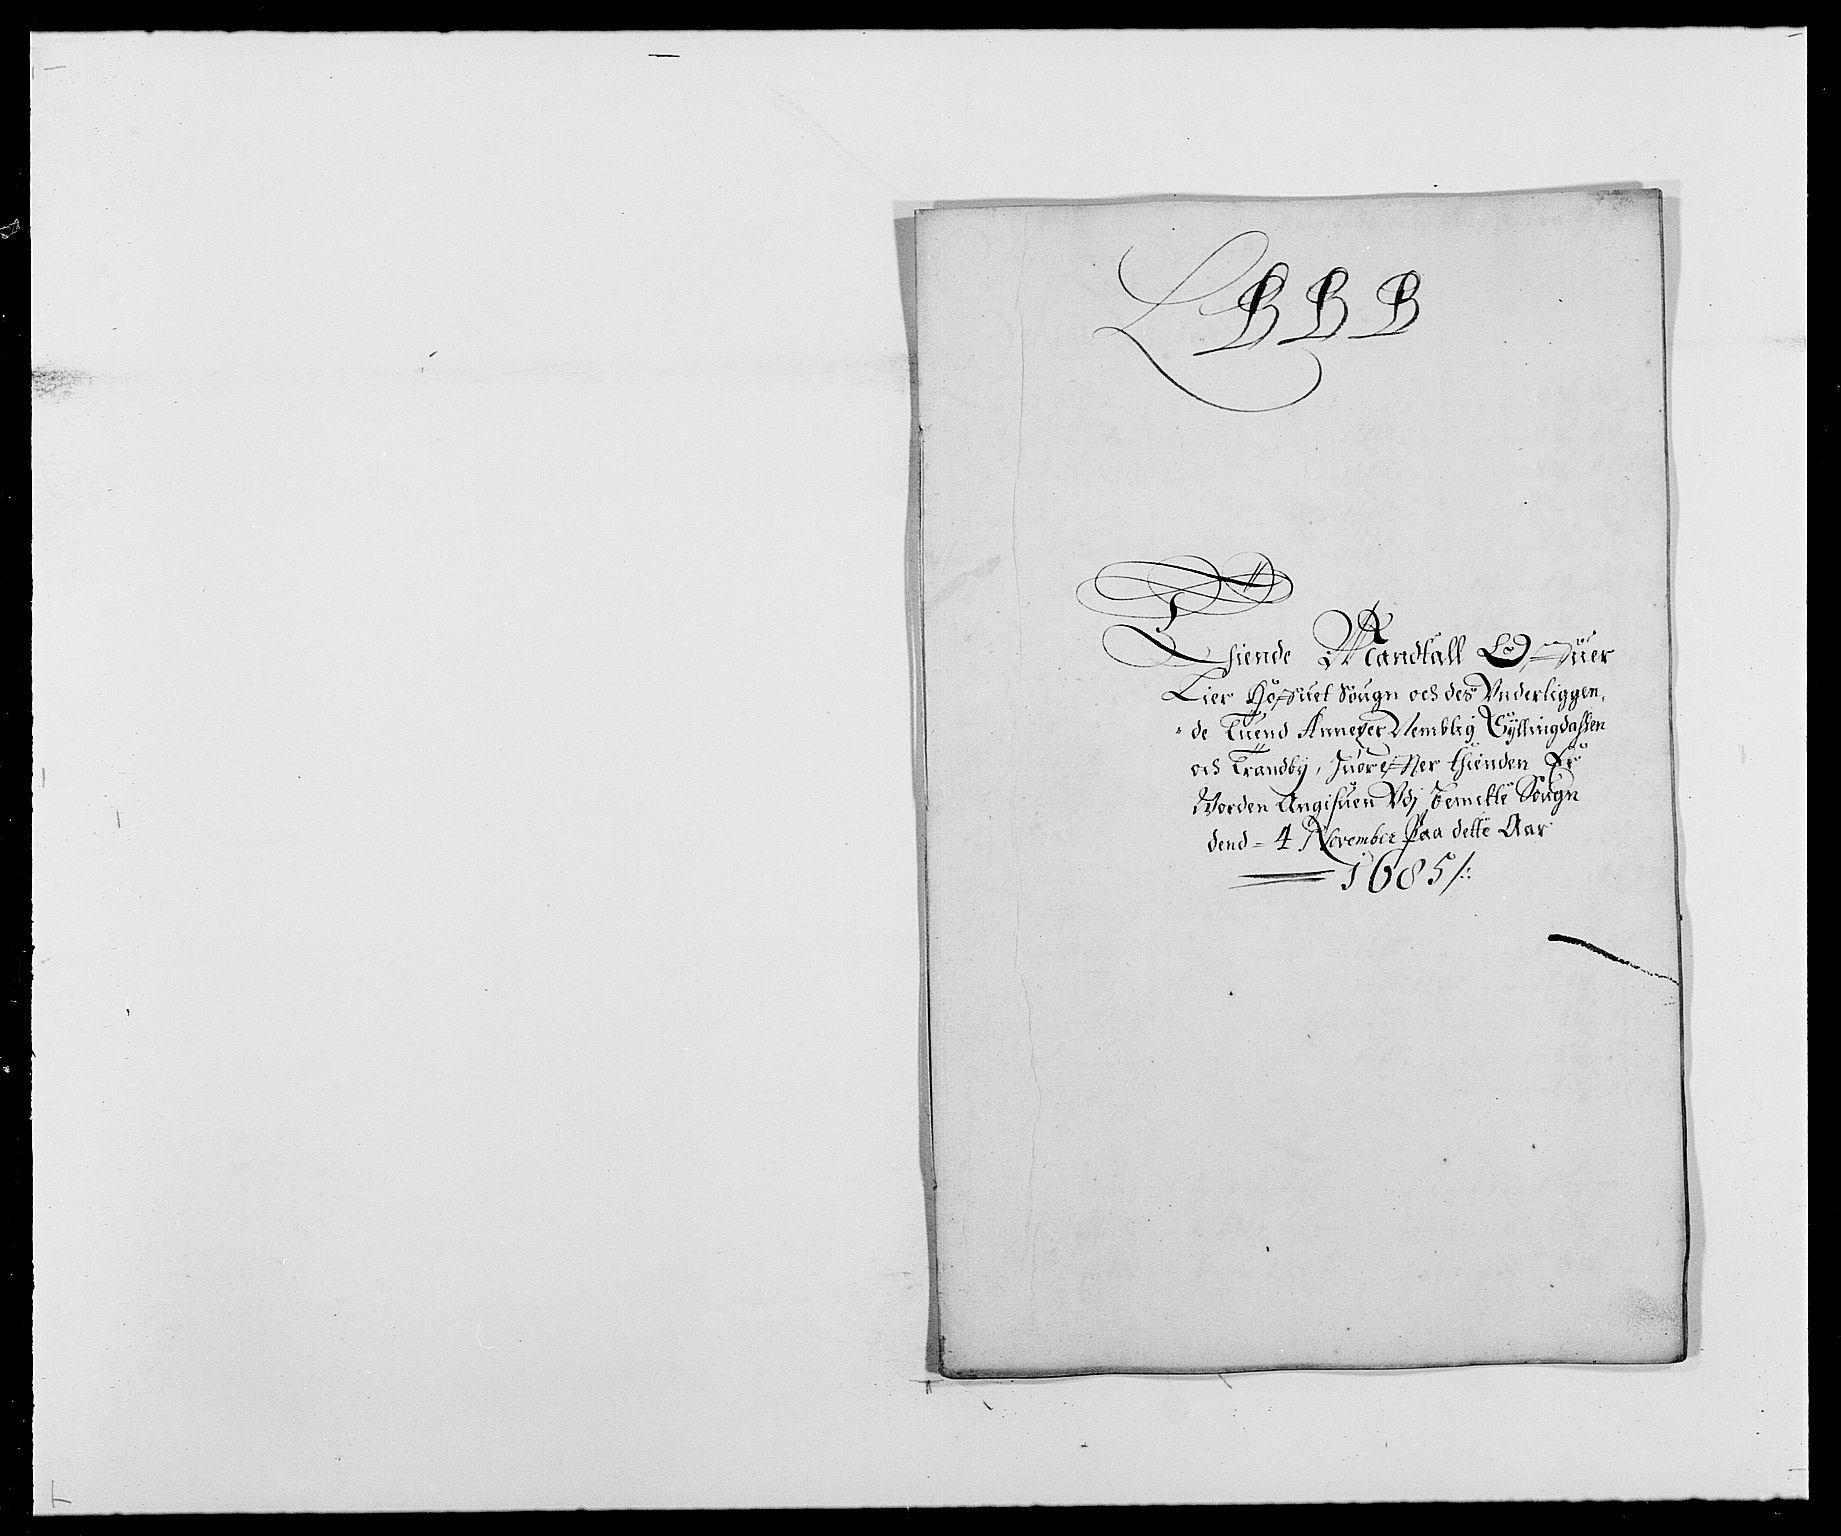 RA, Rentekammeret inntil 1814, Reviderte regnskaper, Fogderegnskap, R27/L1687: Fogderegnskap Lier, 1678-1686, s. 146